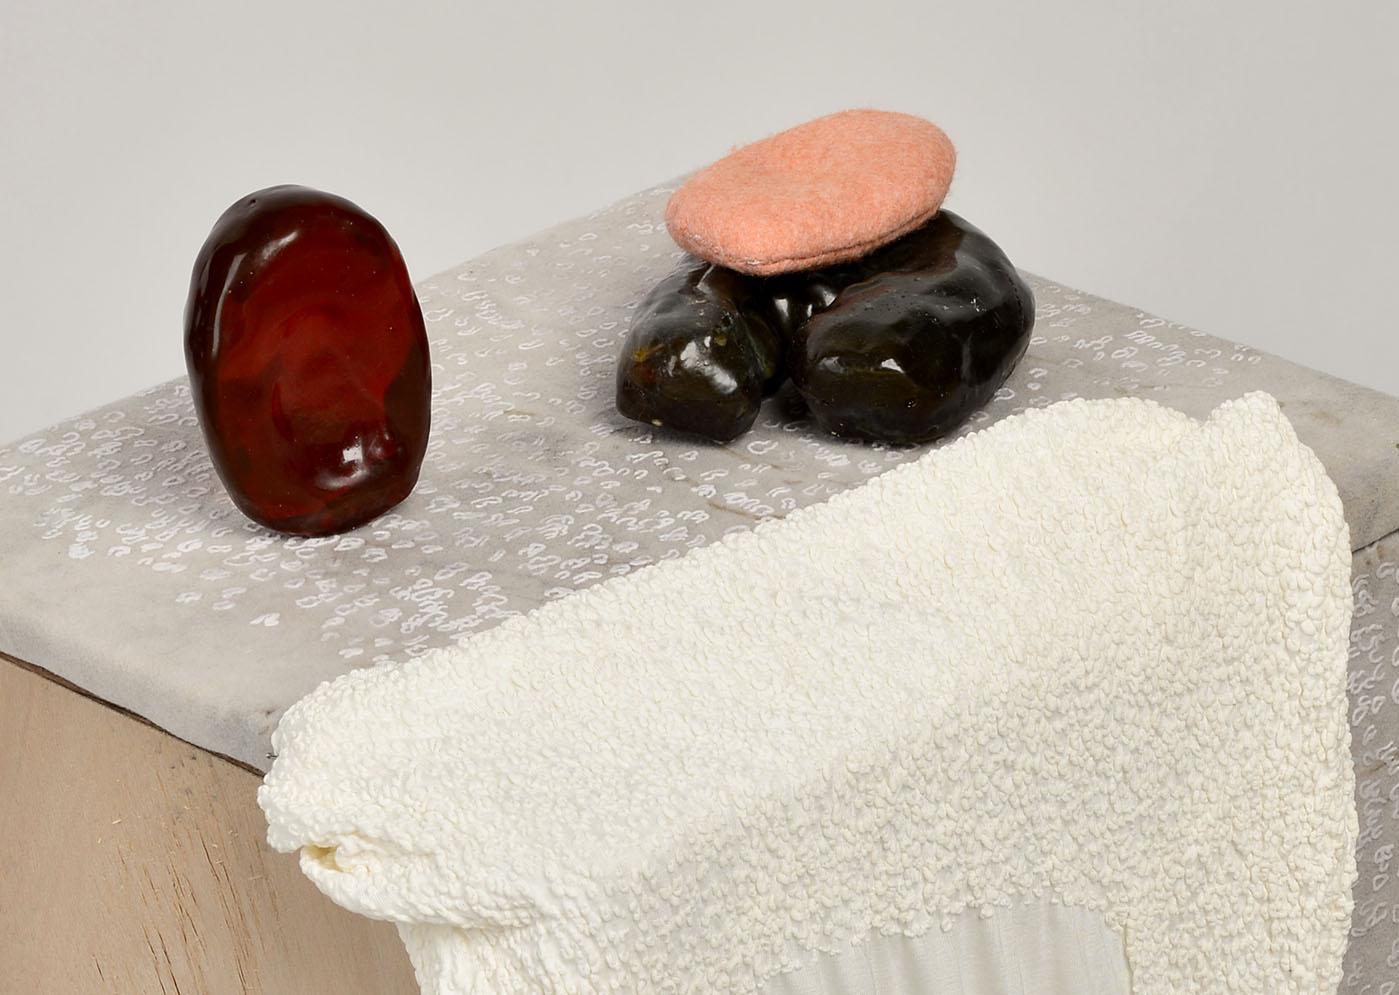 Lottie Percival – Sensory Textiles for Dementia